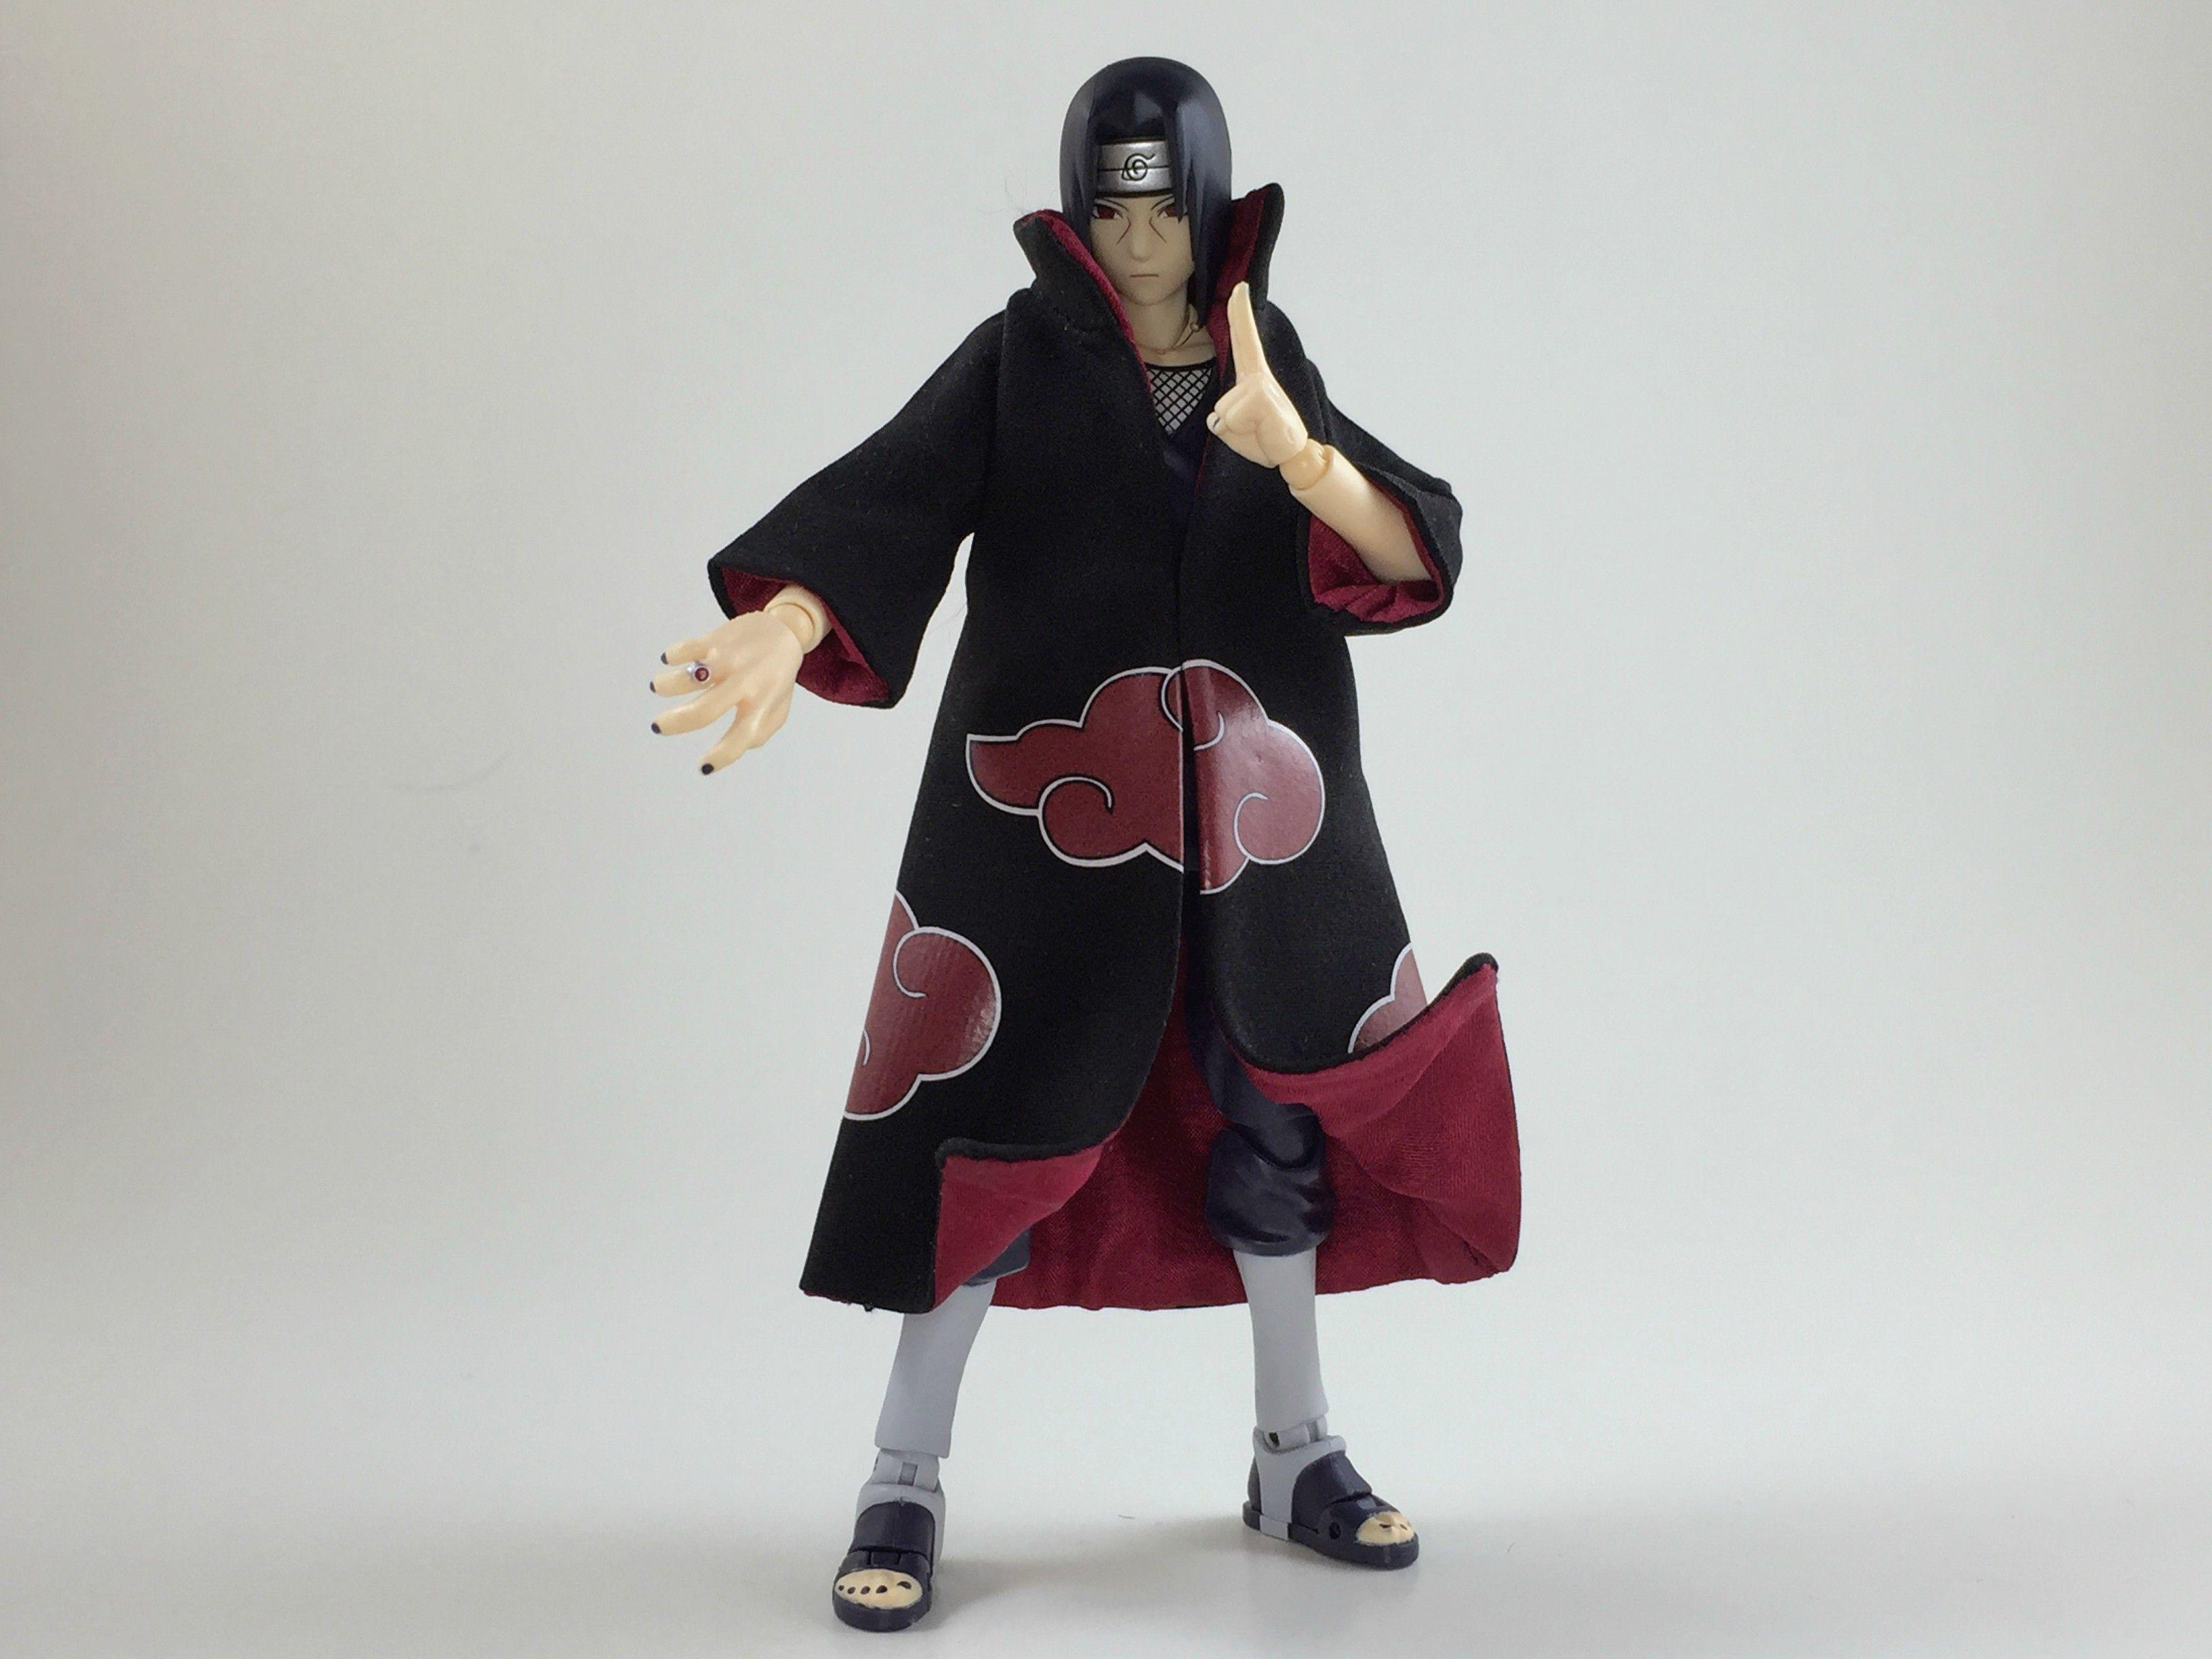 S.H.Figuarts Custom Akatsuki Robe Uchiha Itachi Naruto